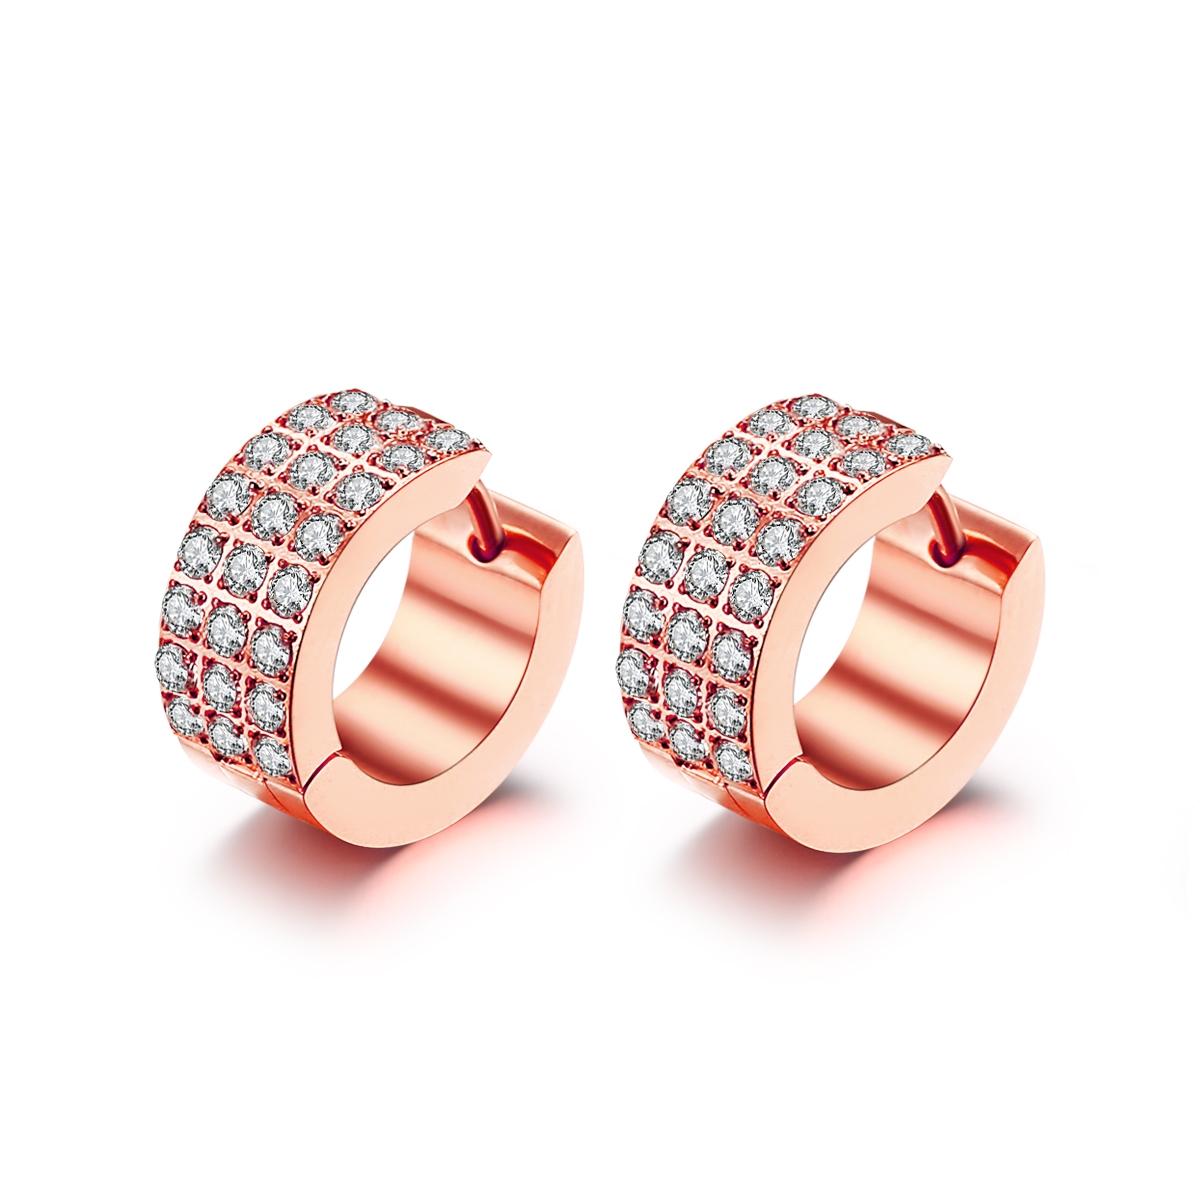 Rosaforgyldt stål creol med zirkonia - 1503332 fra ice diamonds by kranz på brodersen + kobborg